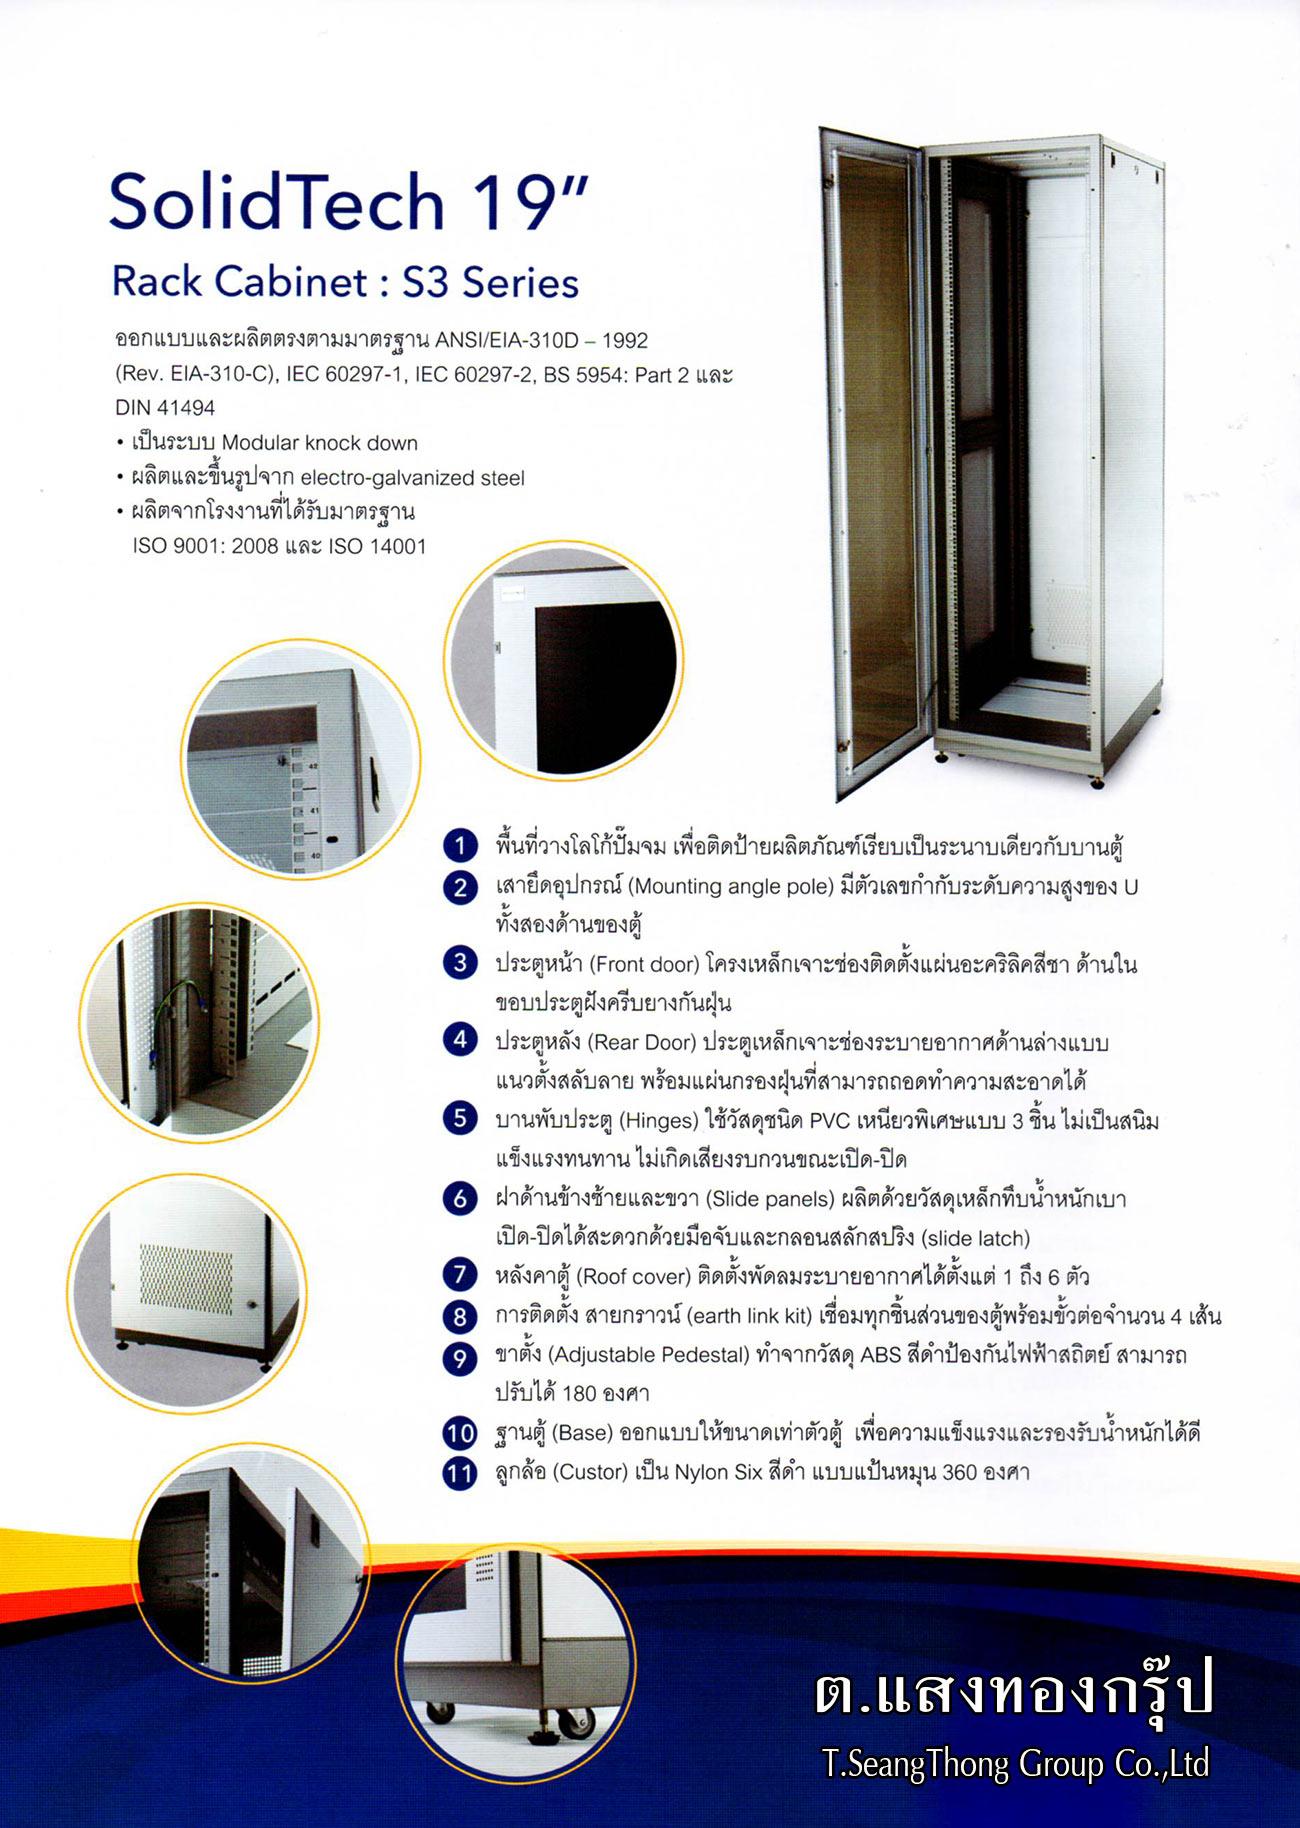 Rack 19inch Series3 Premuim Export Rack Cabinet ตู้แร็ครุ่นทั่วไป